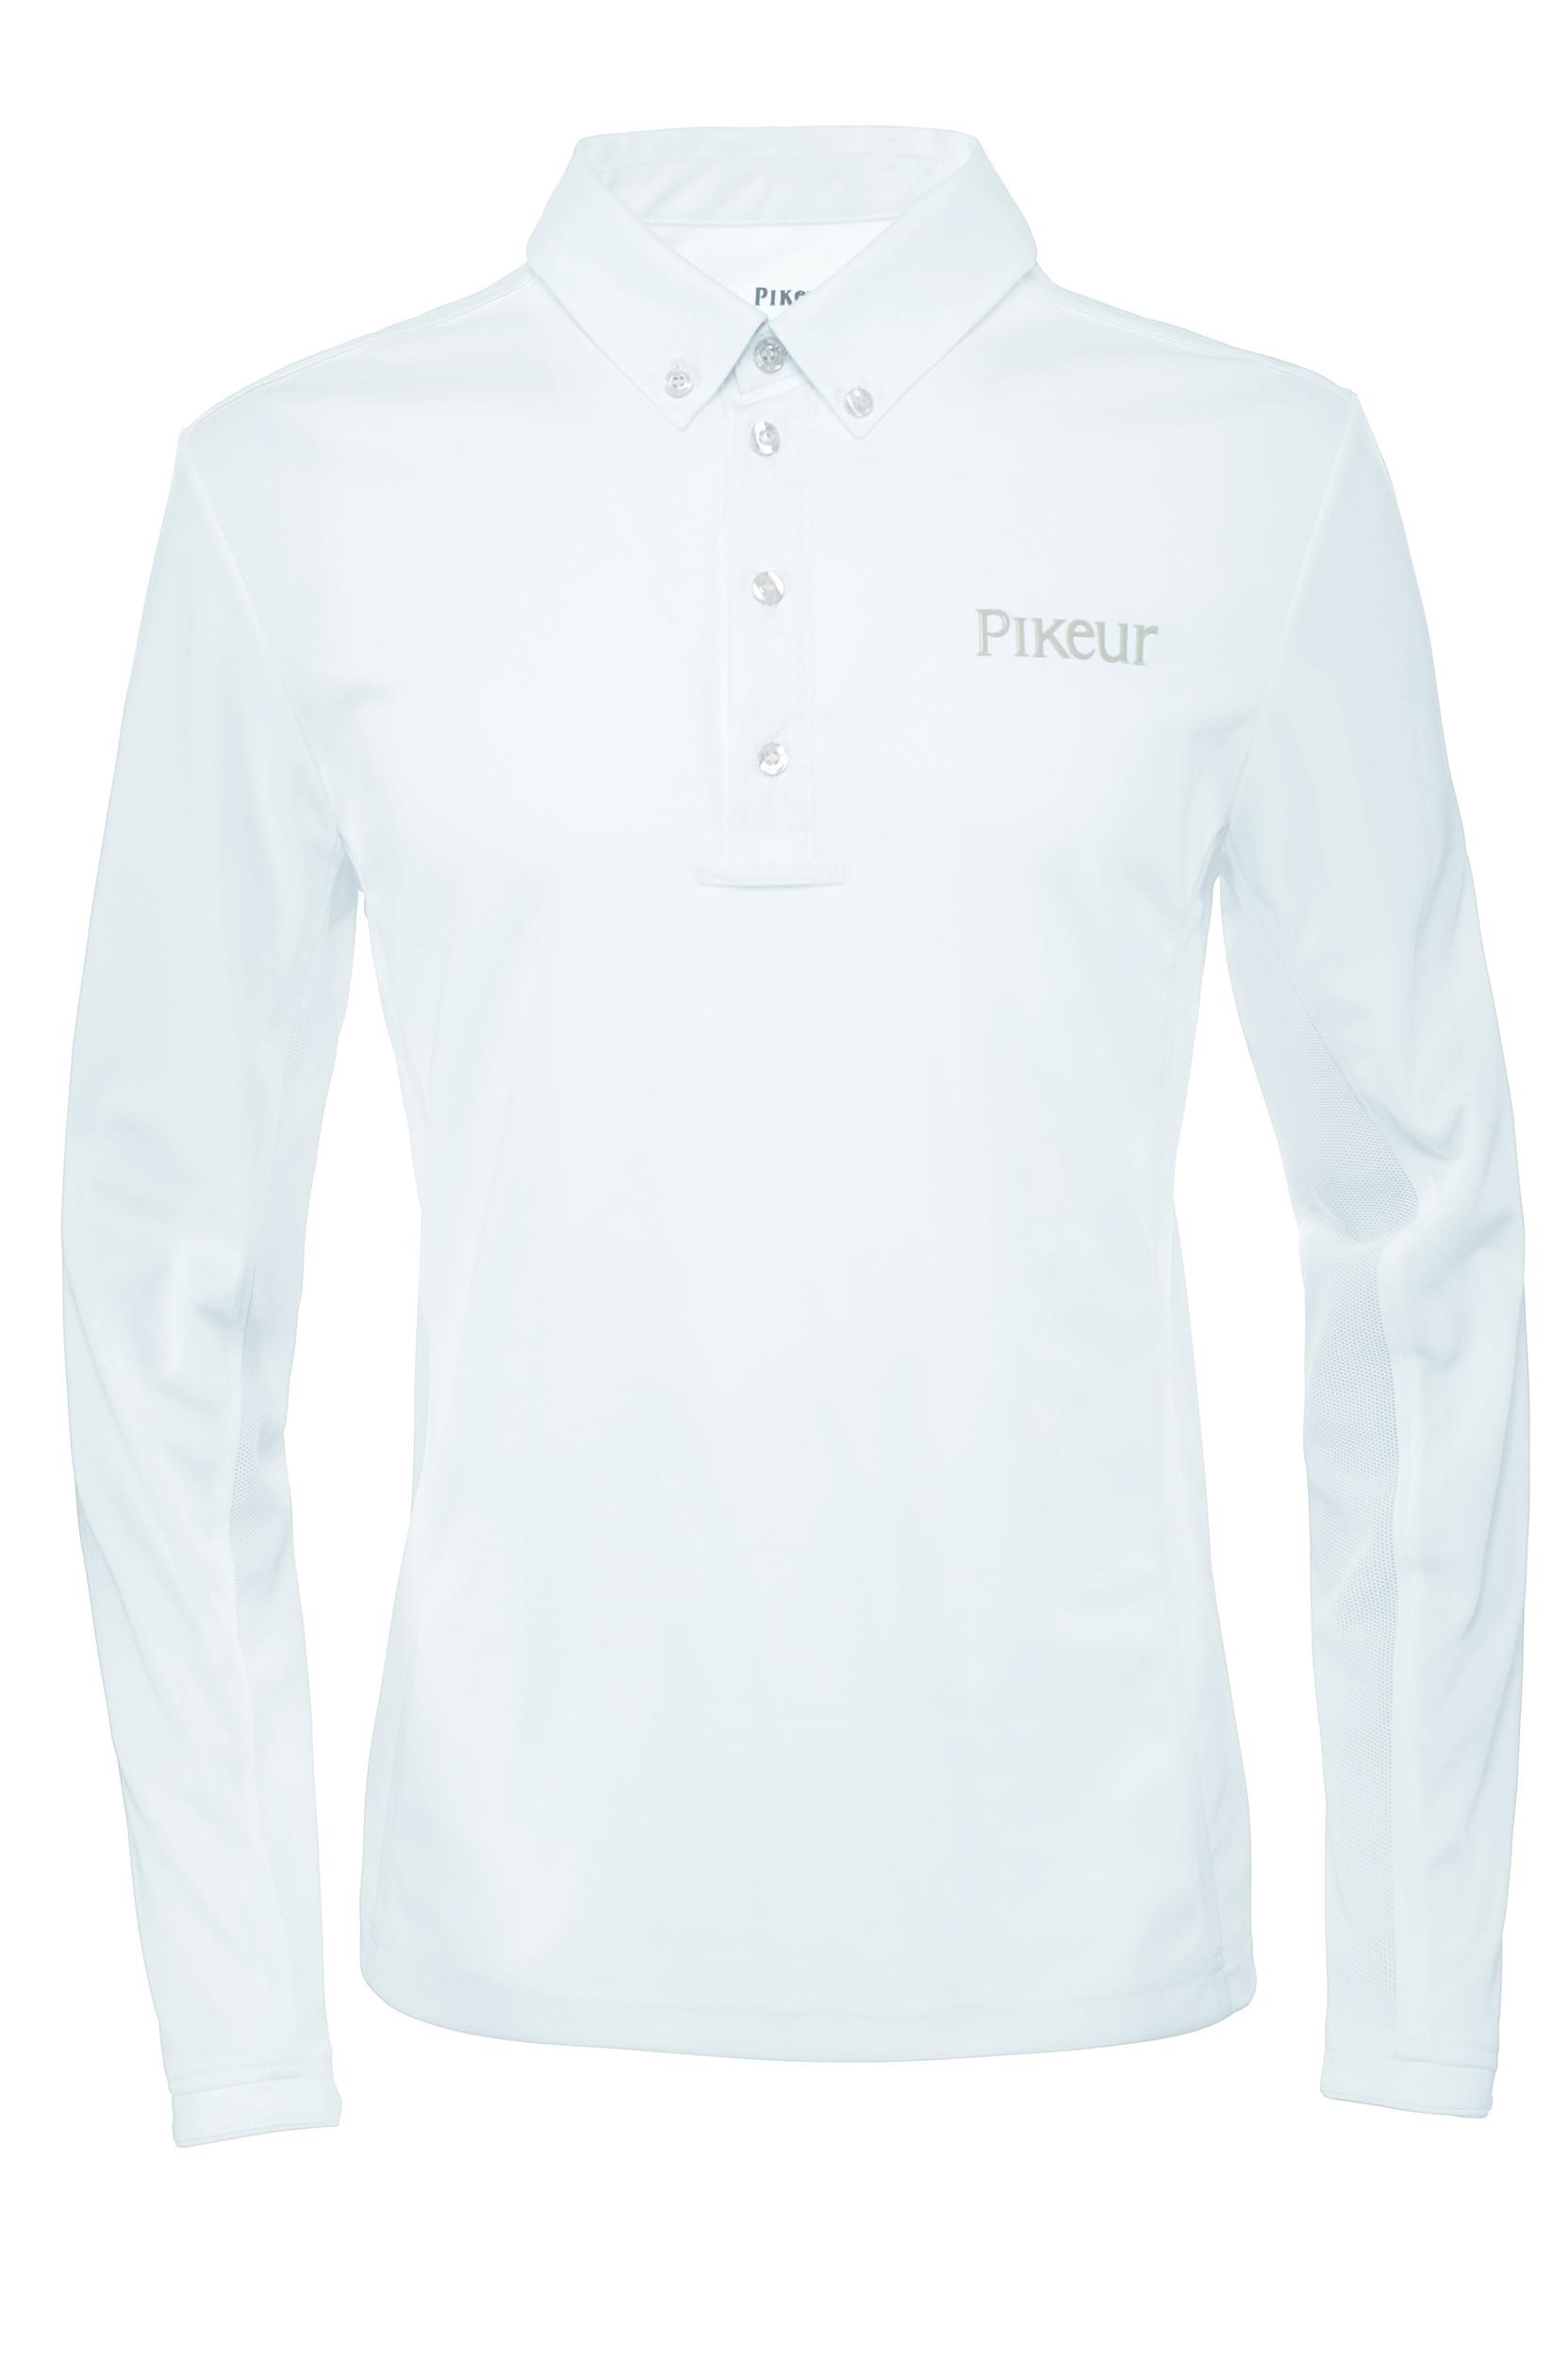 Pikeur Resa Herren Turniershirt